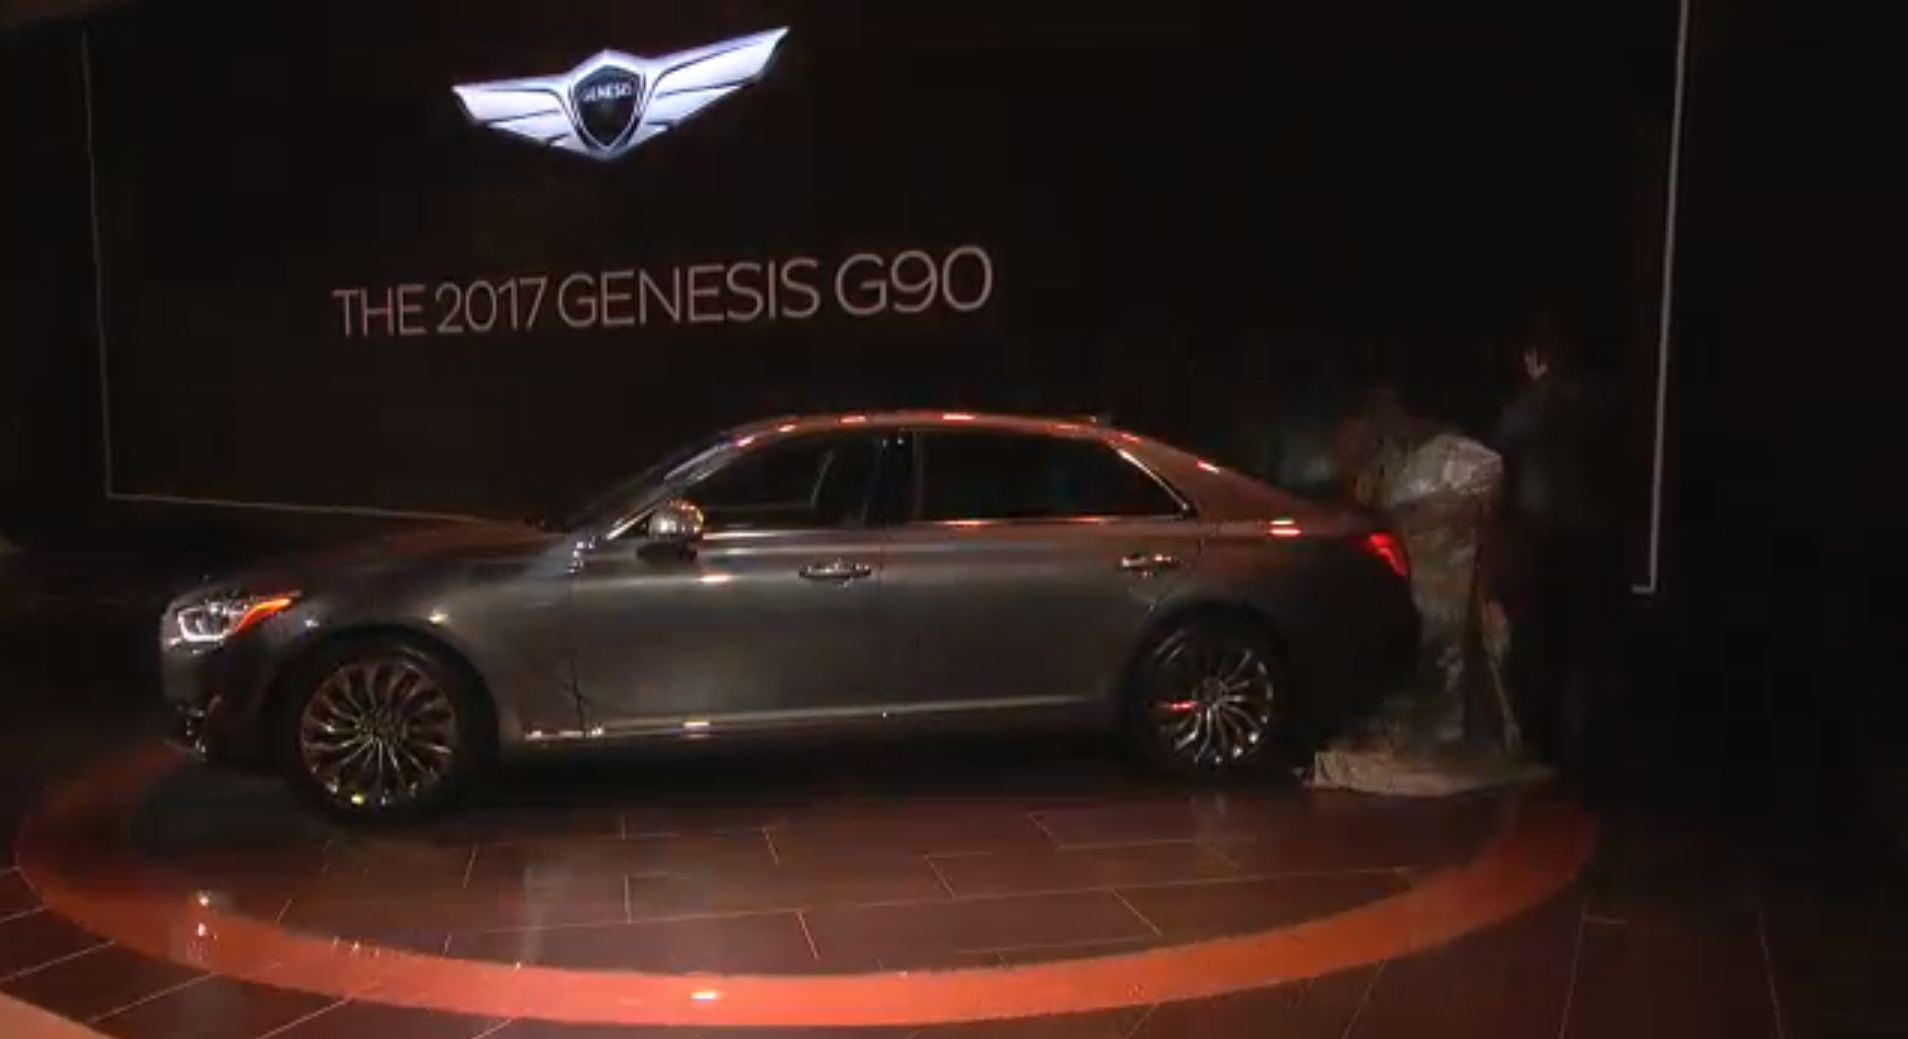 genesis g90 debut takes center stage at hyundai u0026 39 s naias presentation